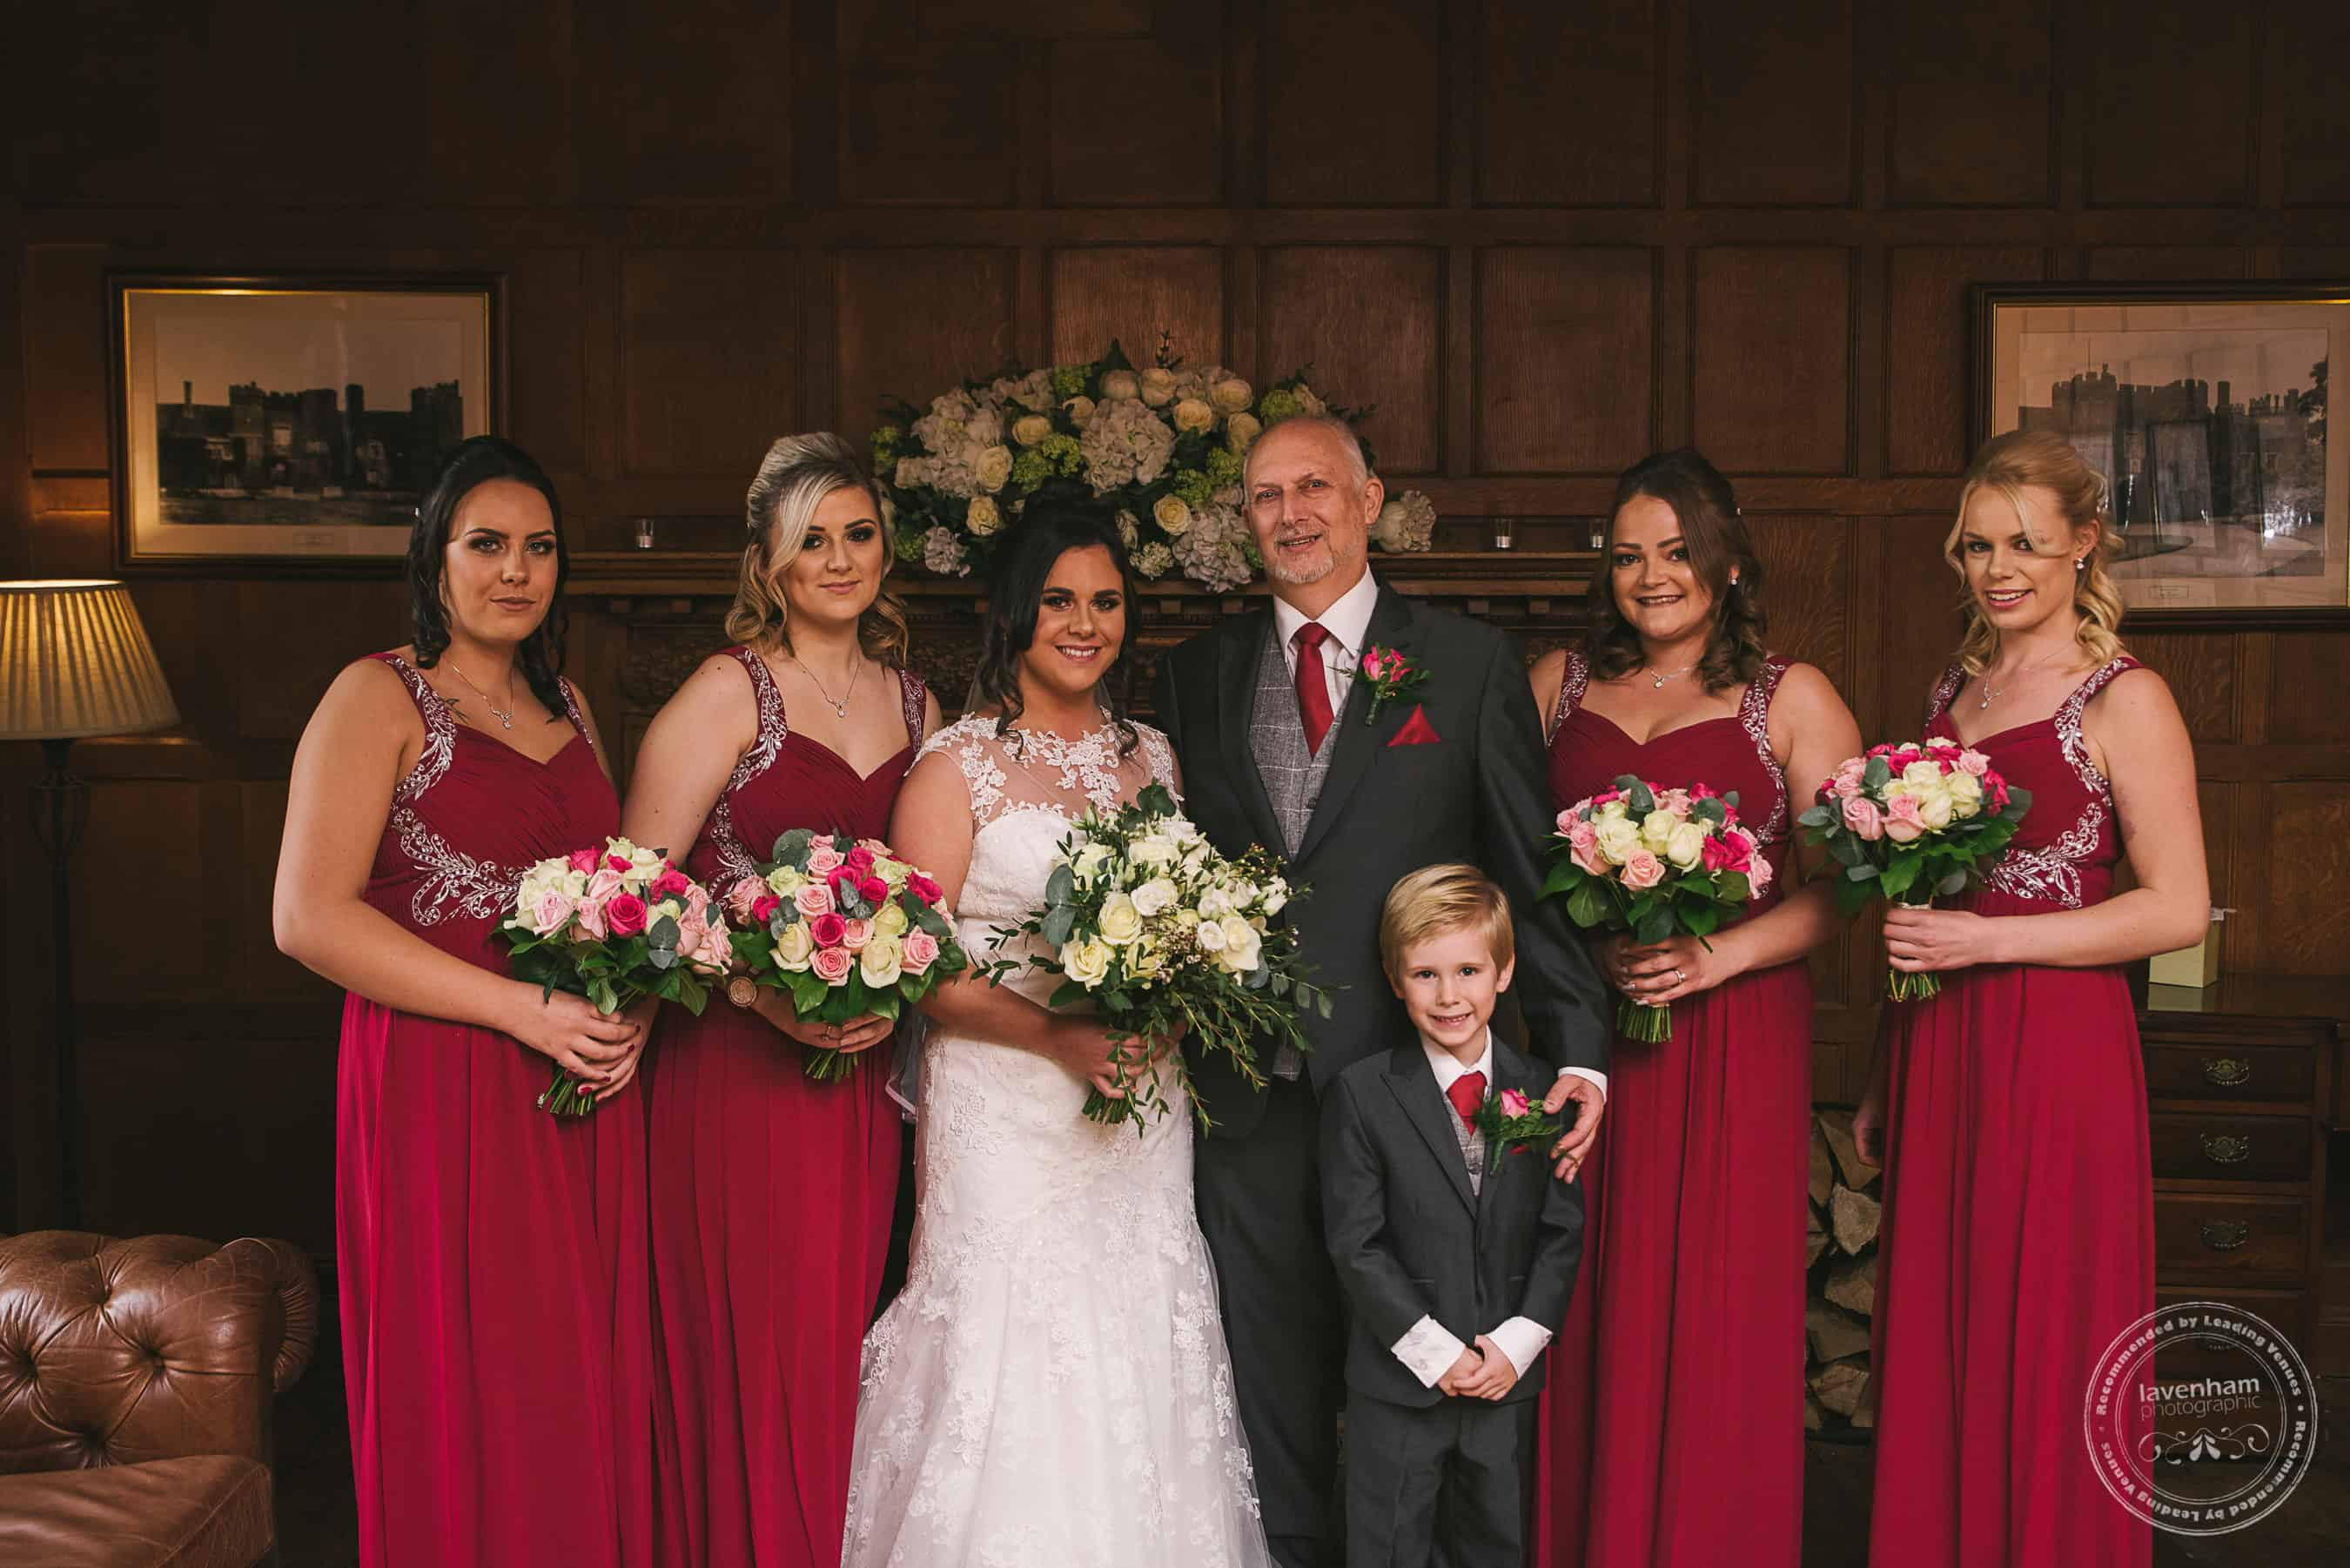 251118 Leez Priory Wedding Photography by Lavenham Photographic 033